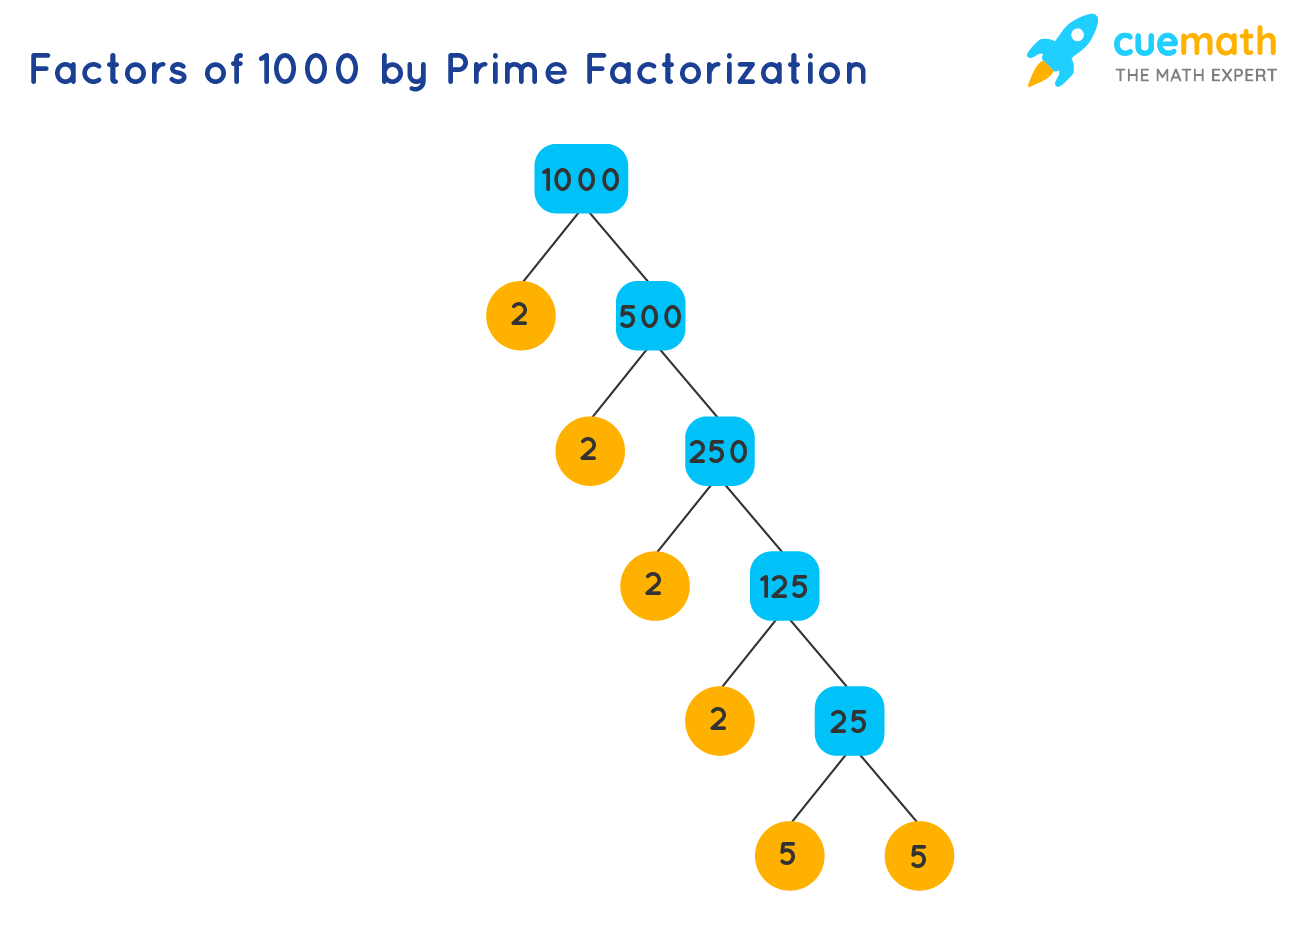 factors of 1000 by prime factorization